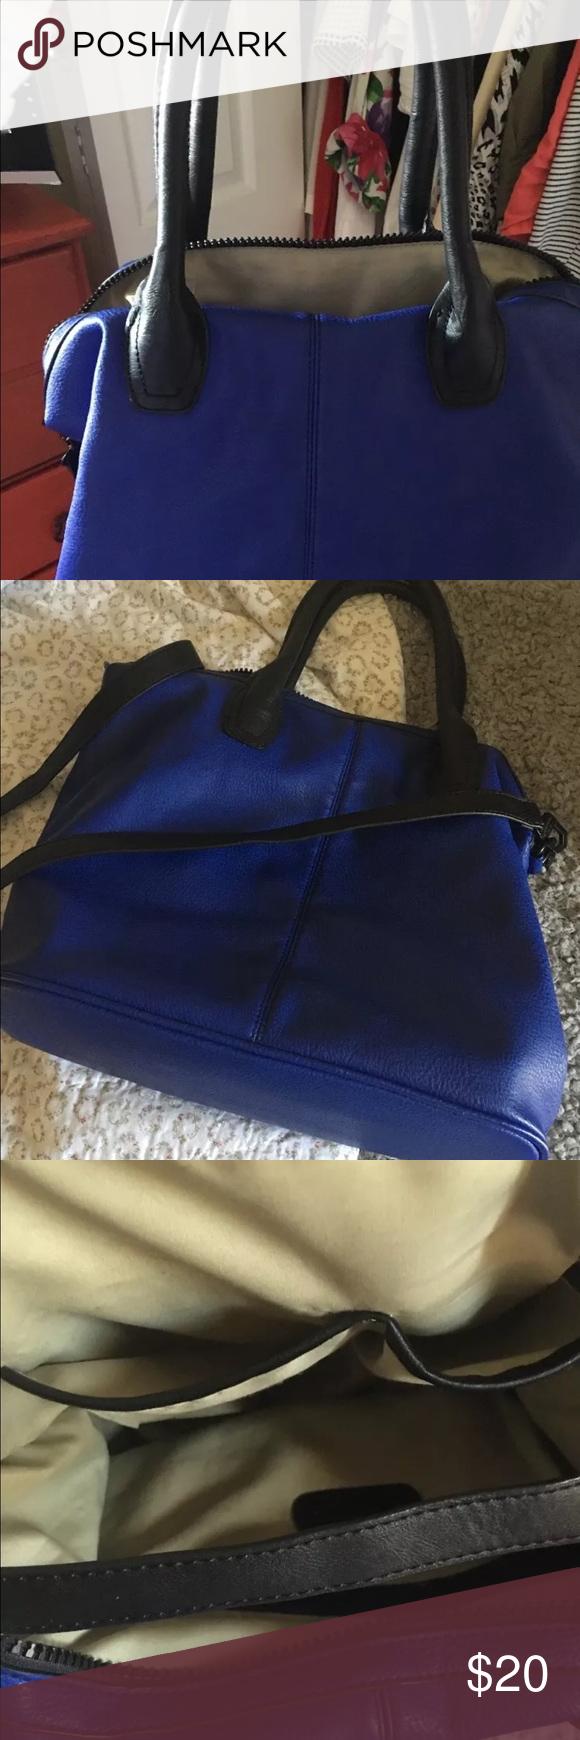 Steve Madden handbag 👜 Very nice and comfortable handbag/ cross body Bags Crossbody Bags